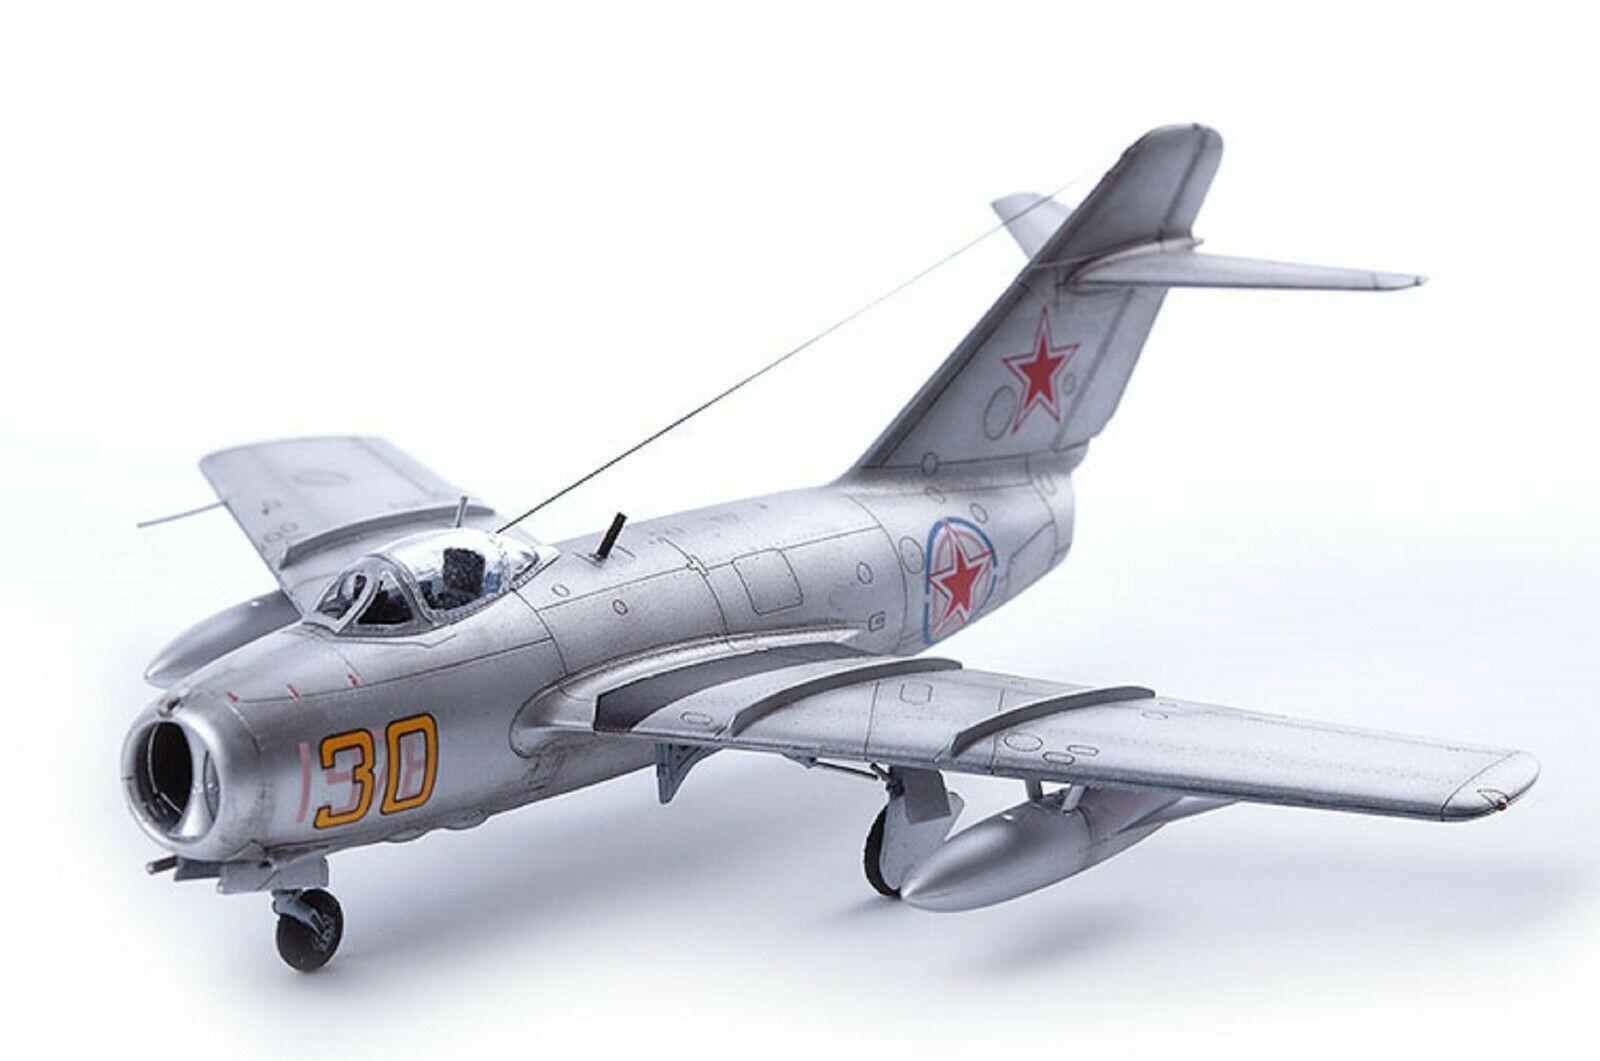 Academy 12566 1:72 MiG-15bis Korean War Air Forces Plamodel Plastic Hobby Model